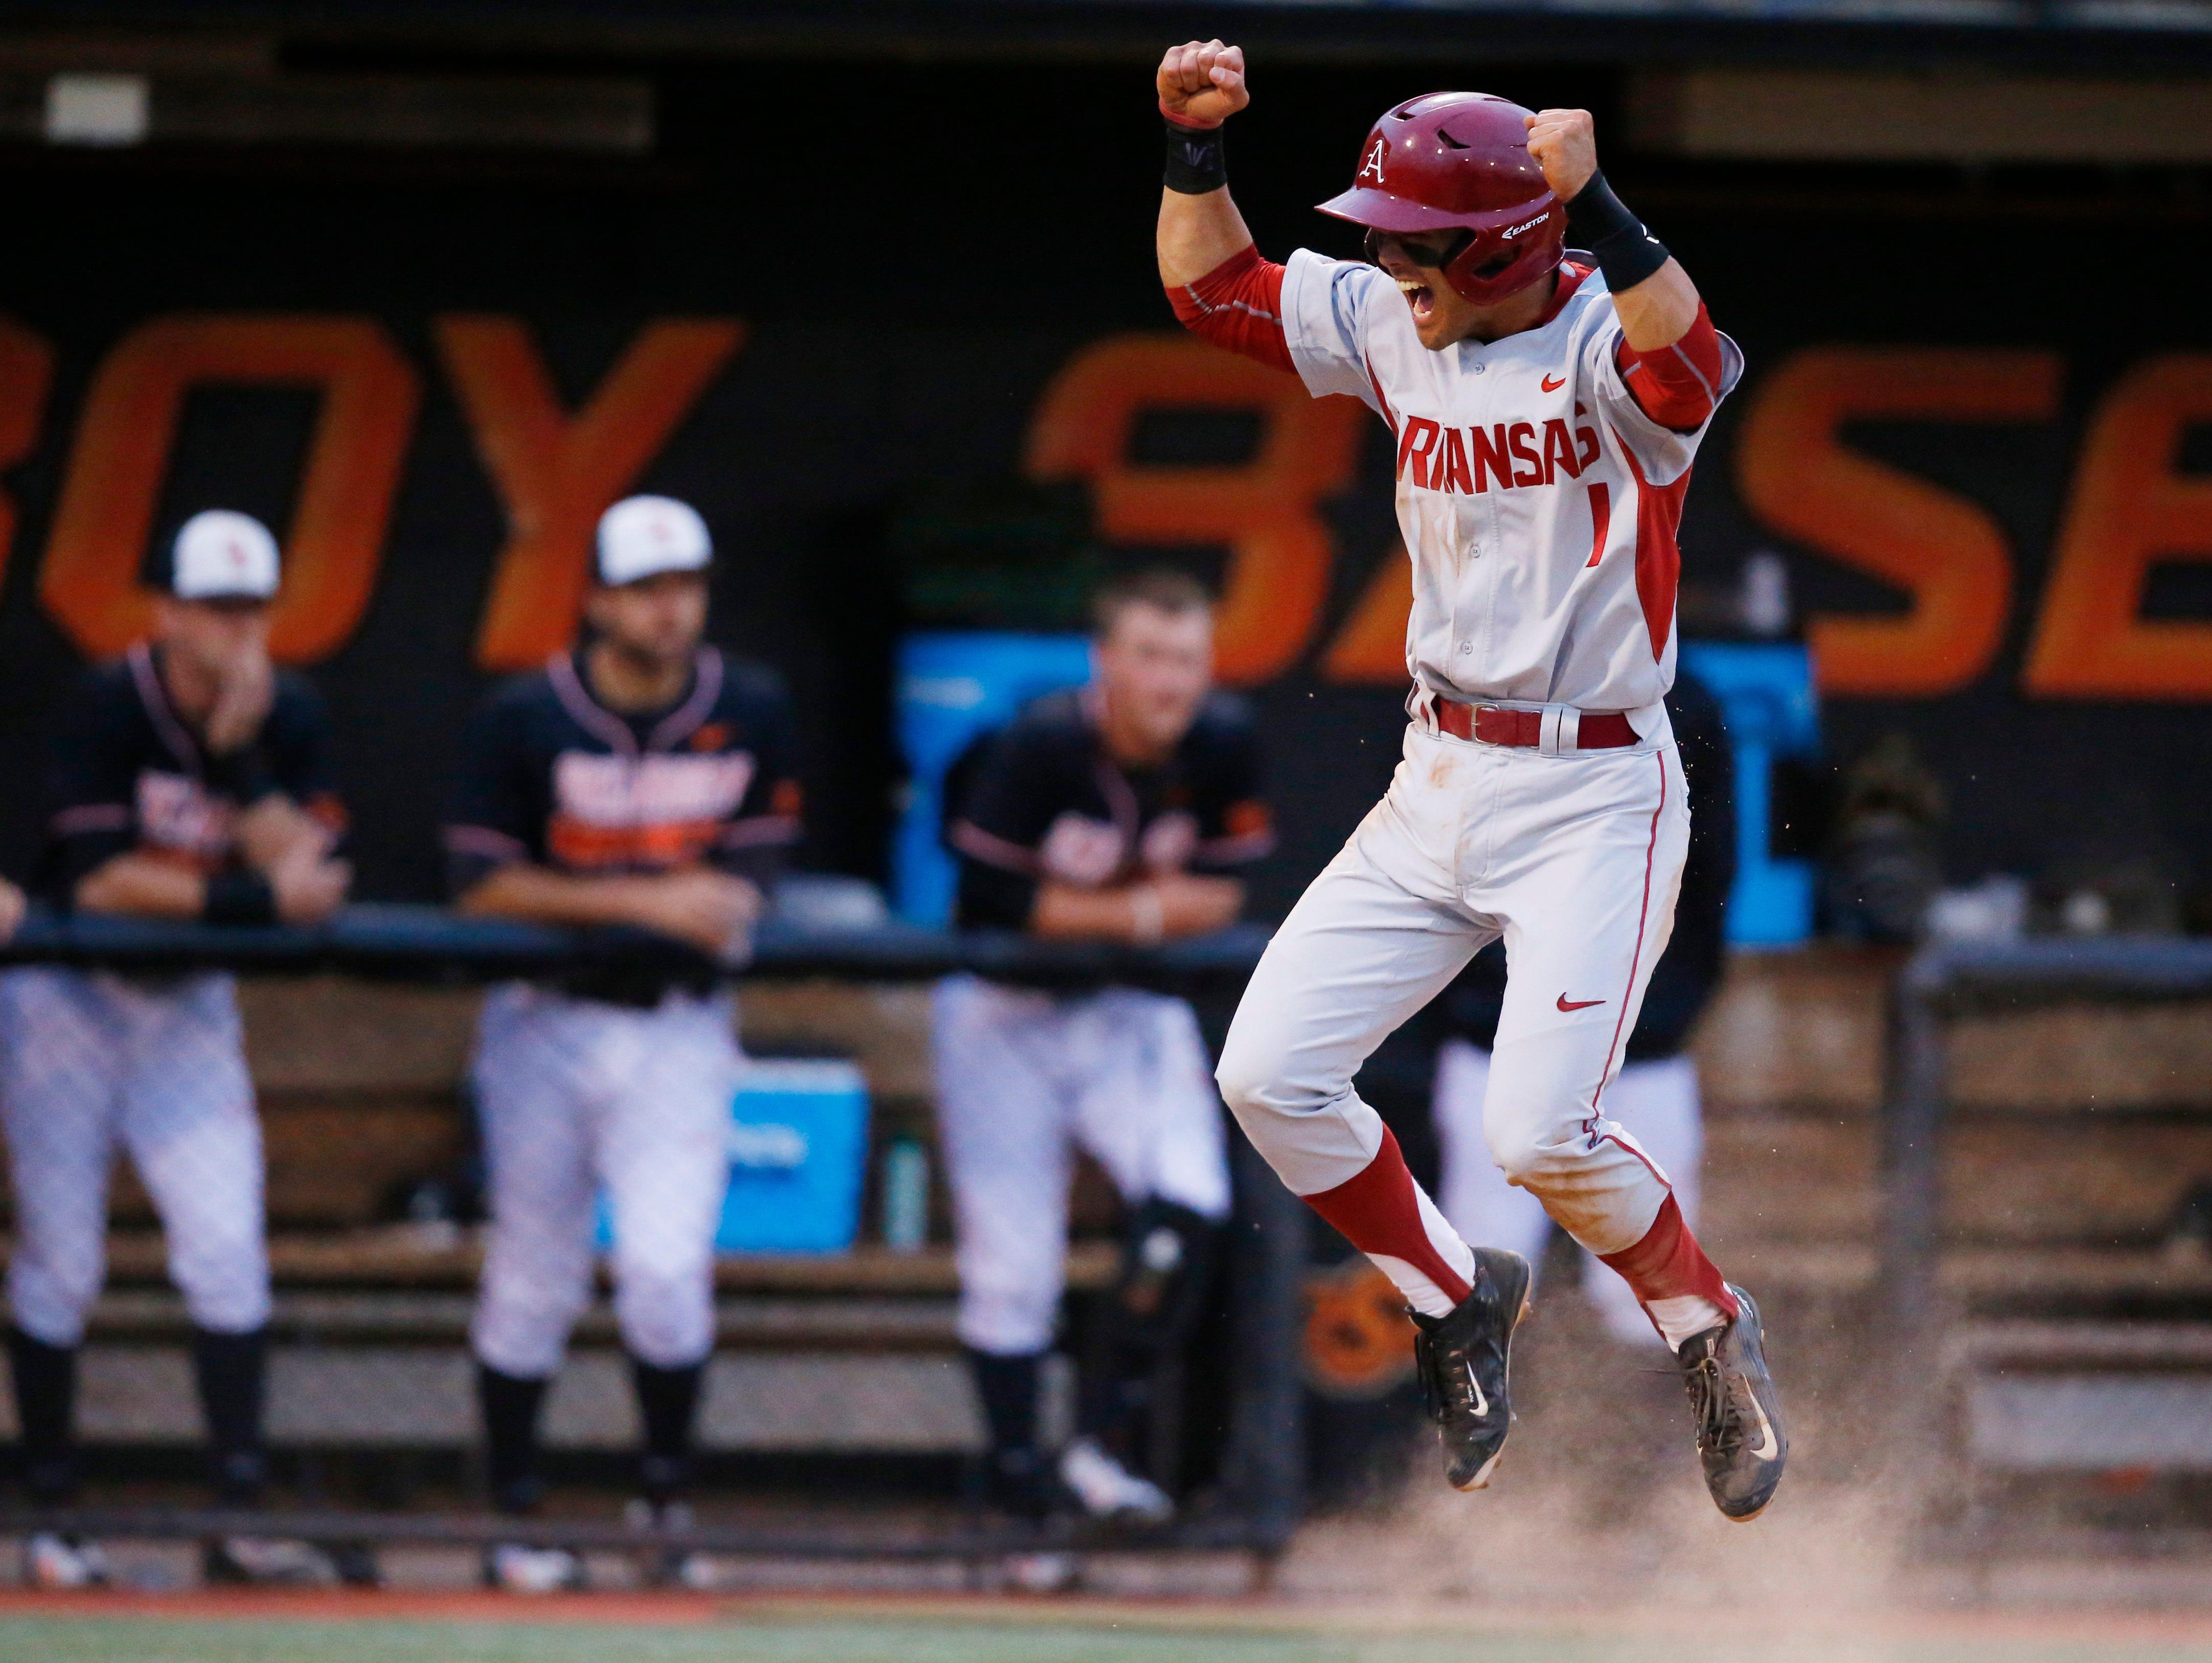 Arkansas' Rick Nomura celebrates after scoring in the eighth inning of an NCAA college baseball tournament regional game against Oklahoma State in Stillwater, Okla., Saturday, May 30, 2015. Arkansas won 7-5. (AP Photo/Sue Ogrocki)